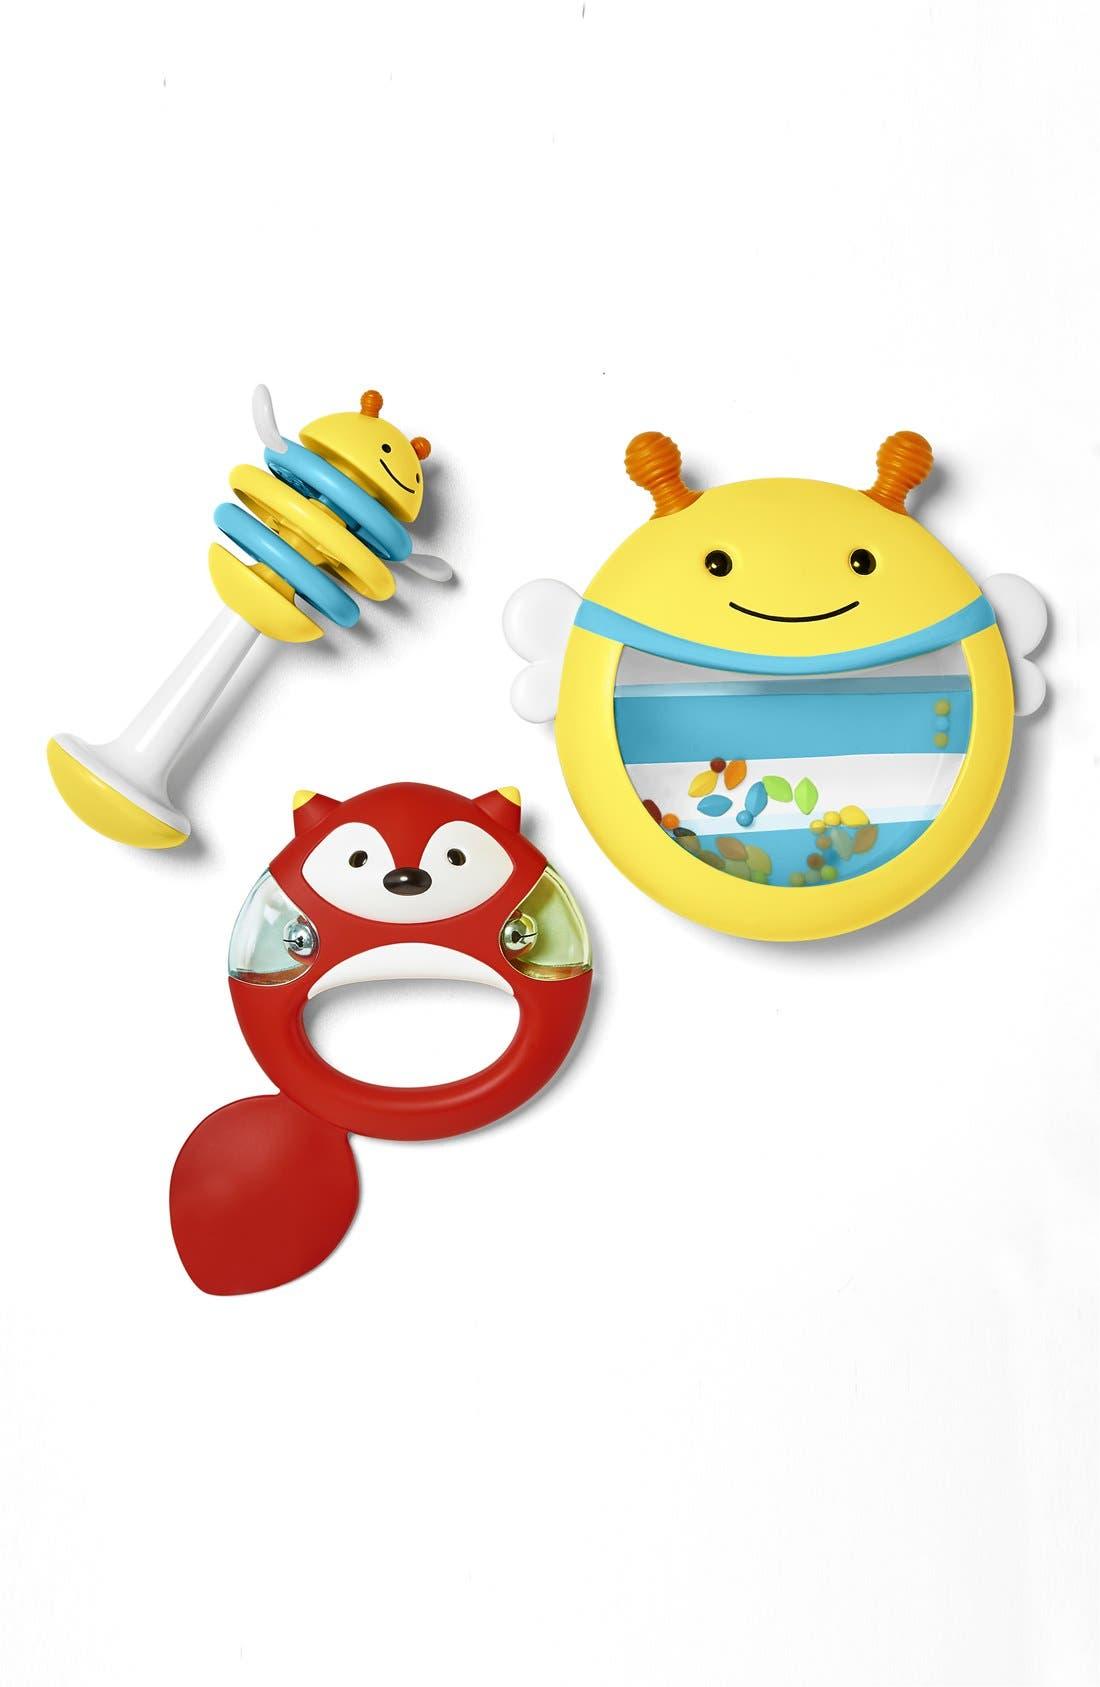 Main Image - Skip Hop Musical Instrument Set